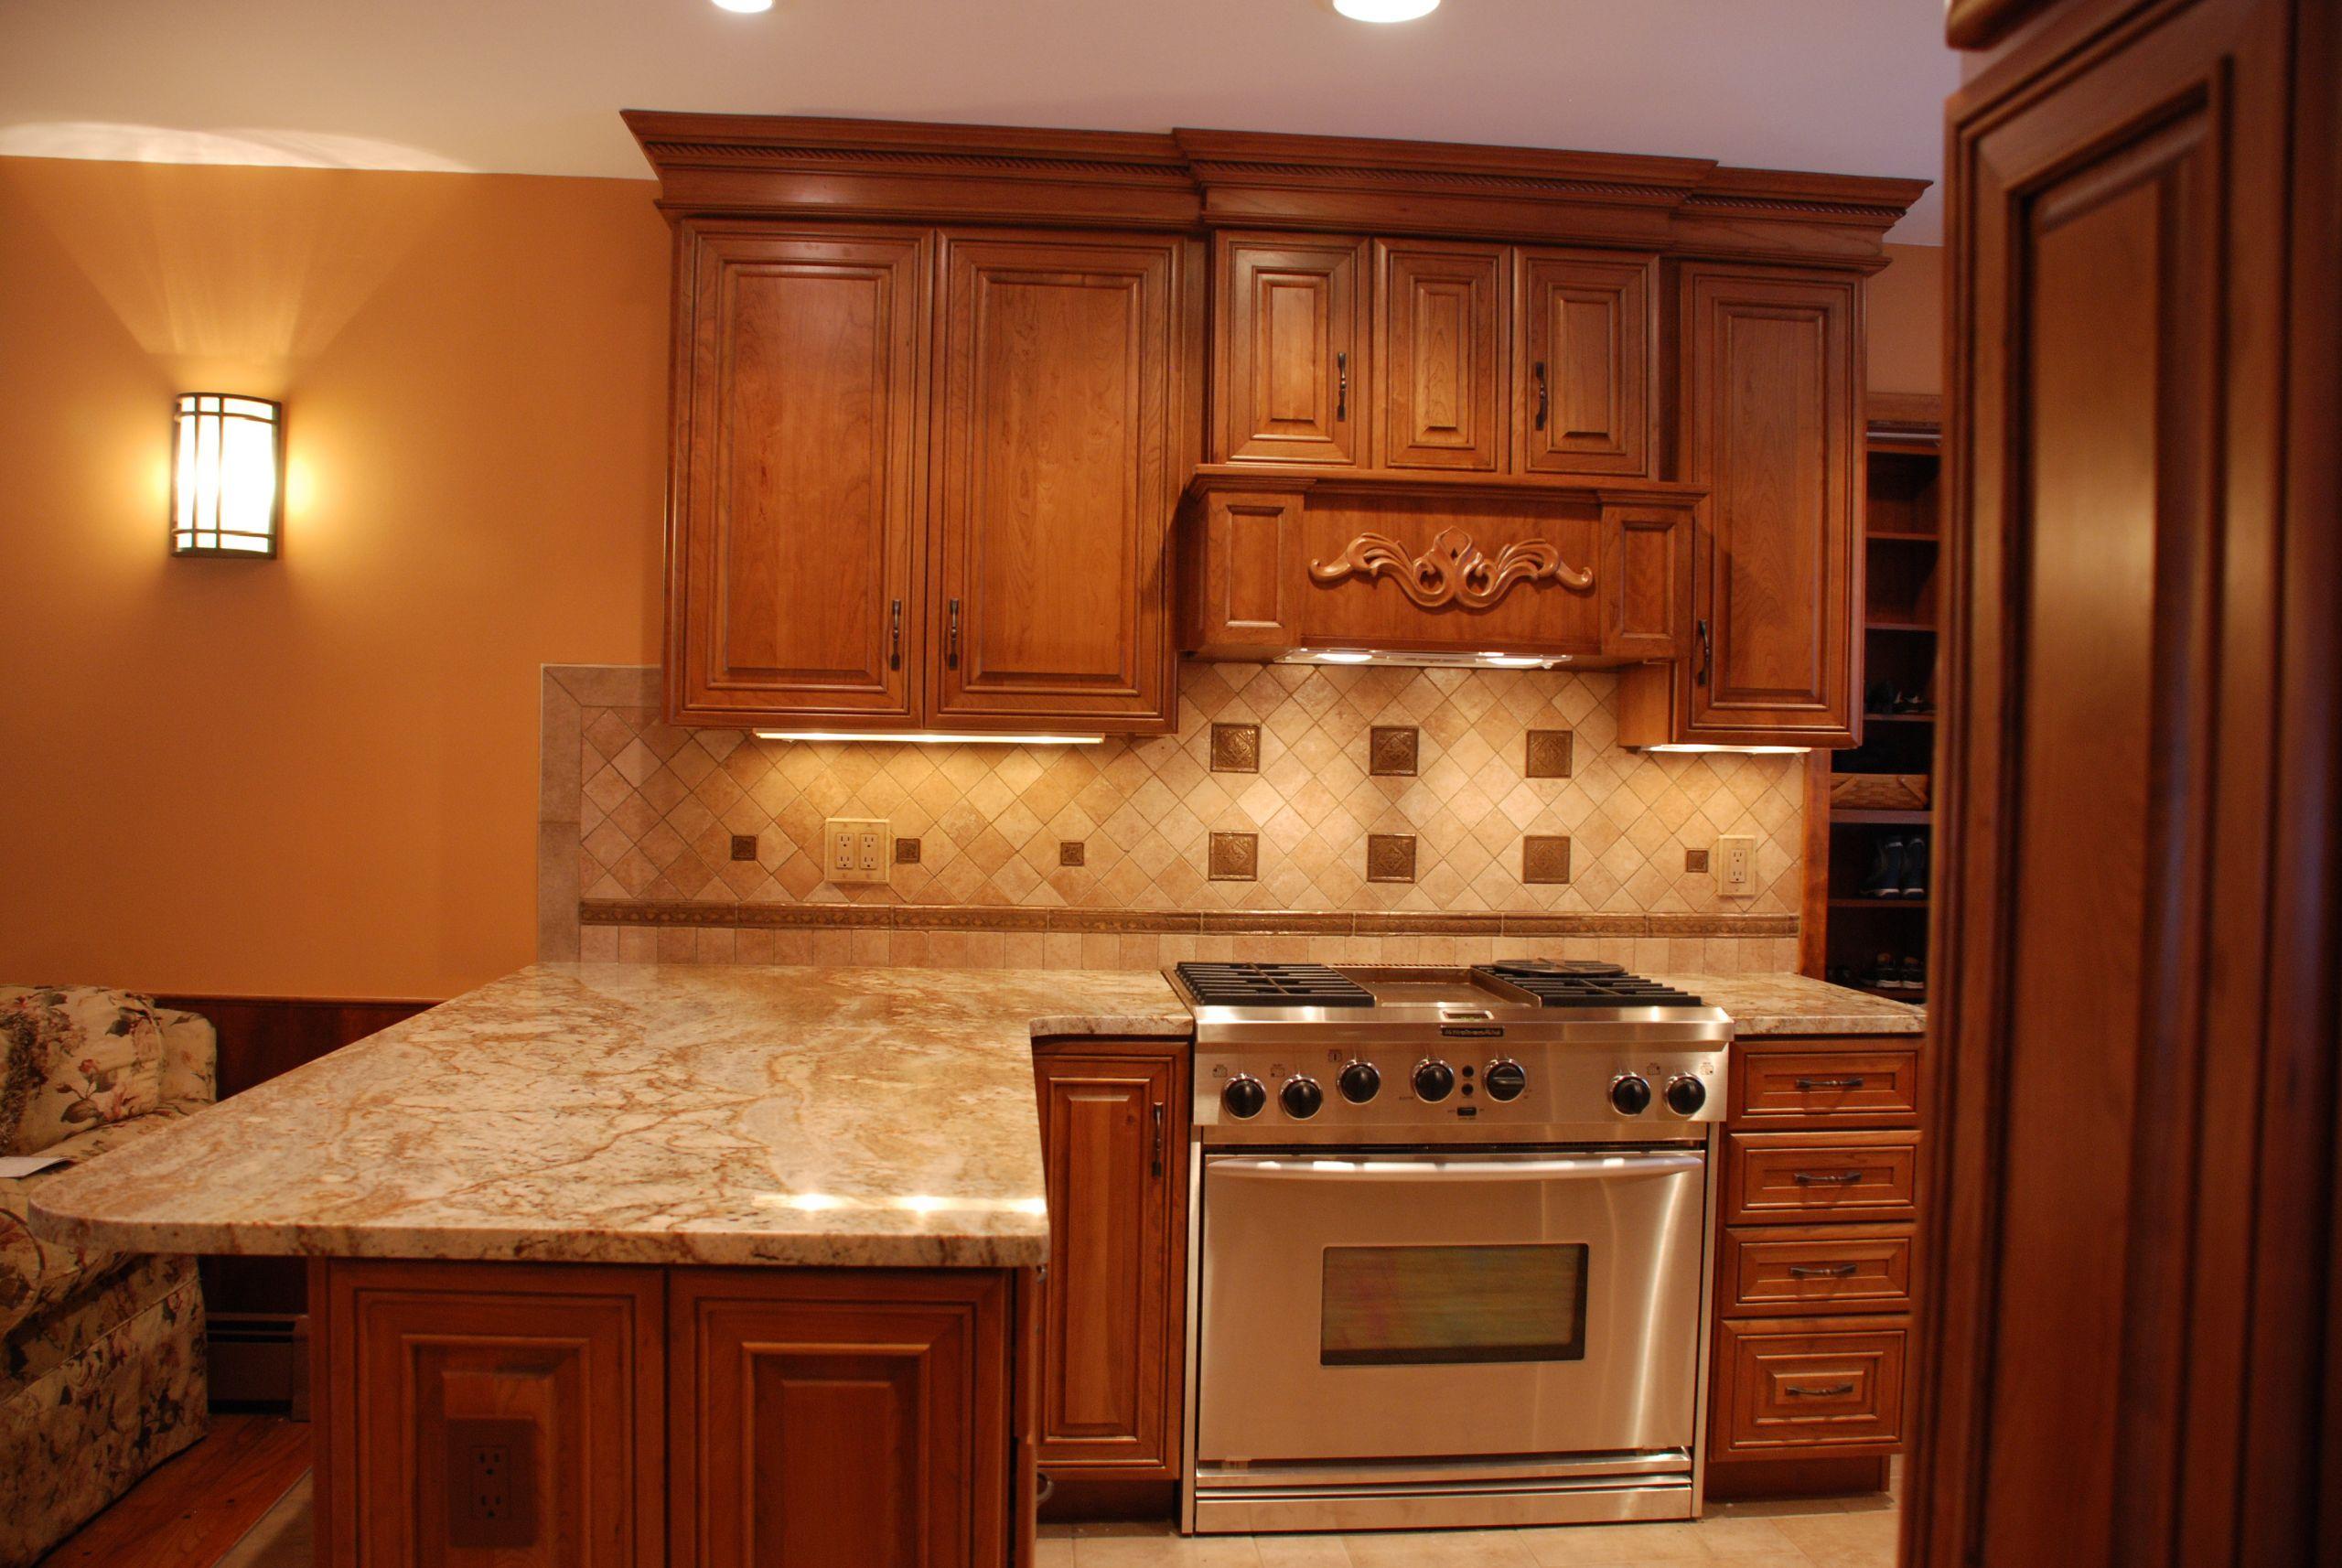 Kitchen Under Cabinet Lighting Options  Xenon Under Cabinet Lighting